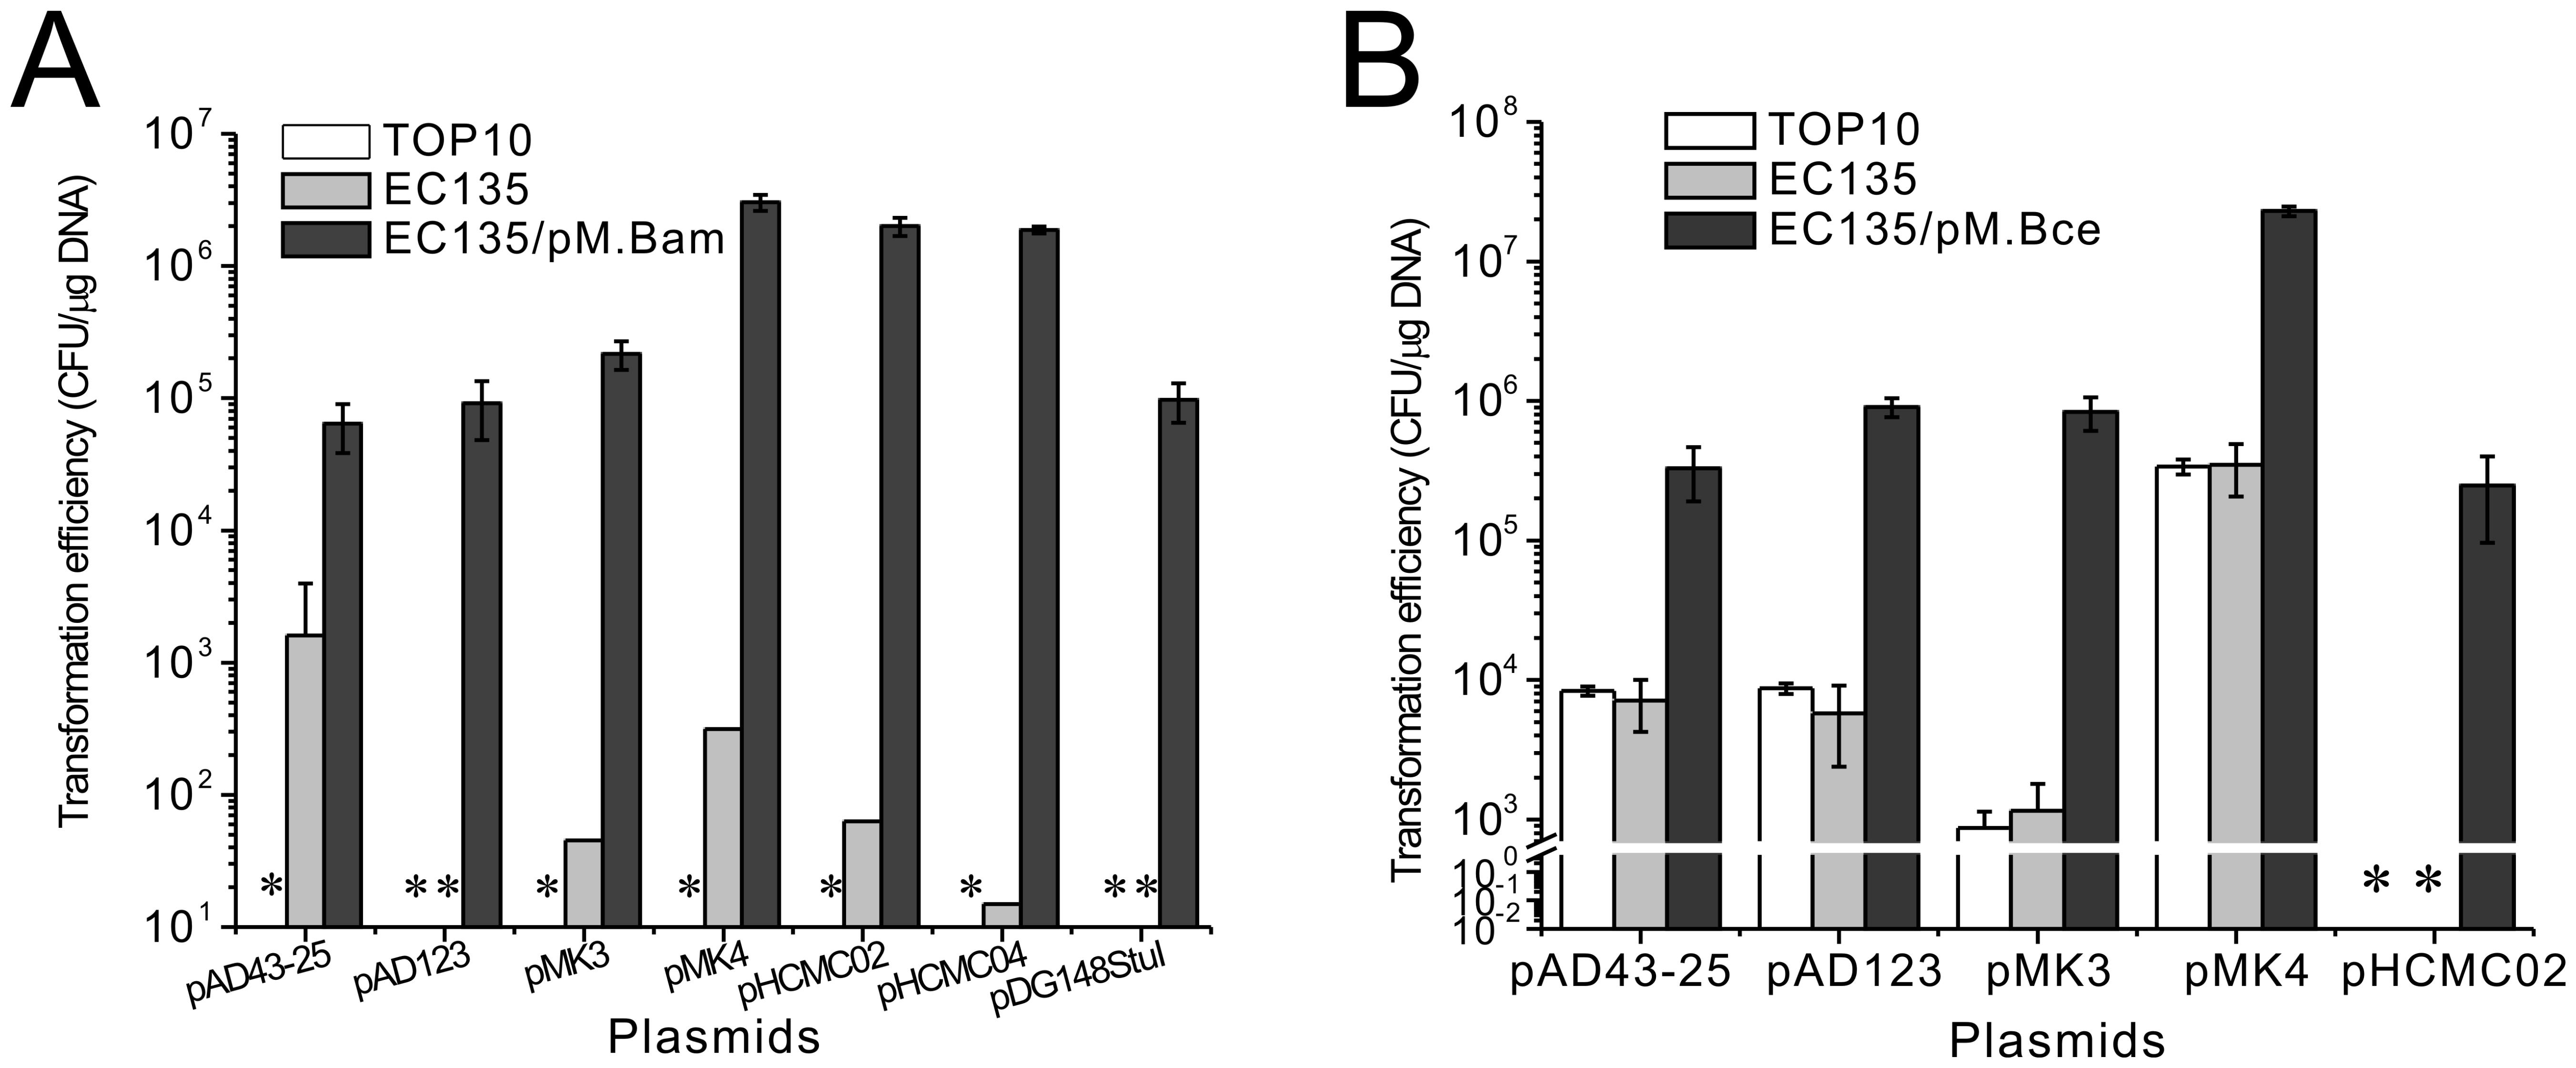 Transformation efficiency of <i>B. amyloliquefaciens</i> TA208 and <i>B. cereus</i> ATCC 10987 with various shuttle plasmids.